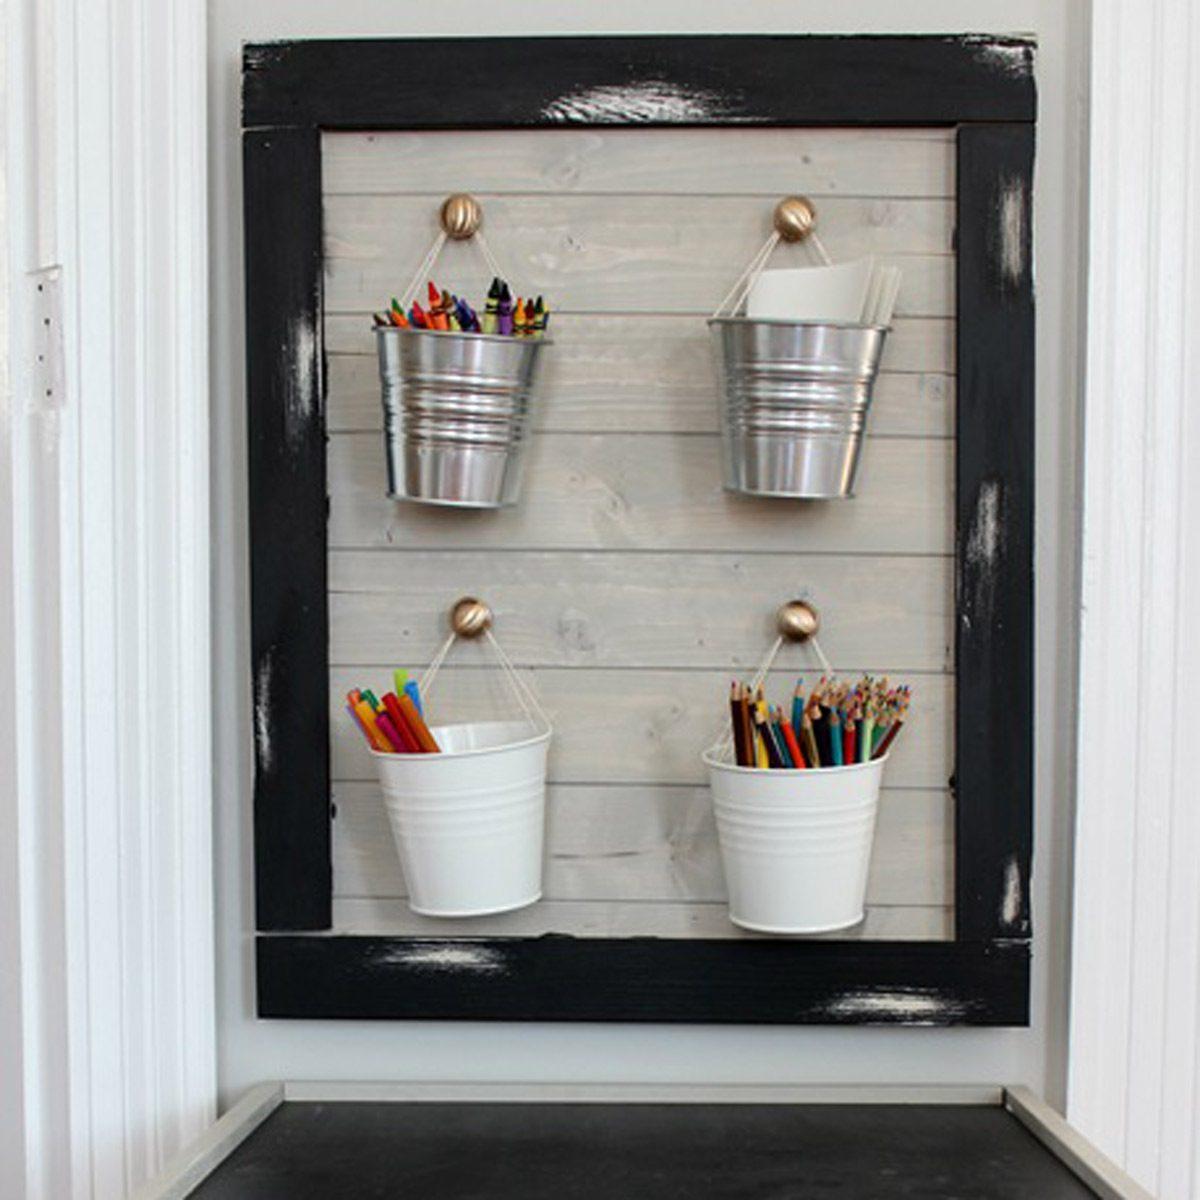 Kids-Art-Station_thumb Hang Galvanized Pails school supplies crafts organization storage